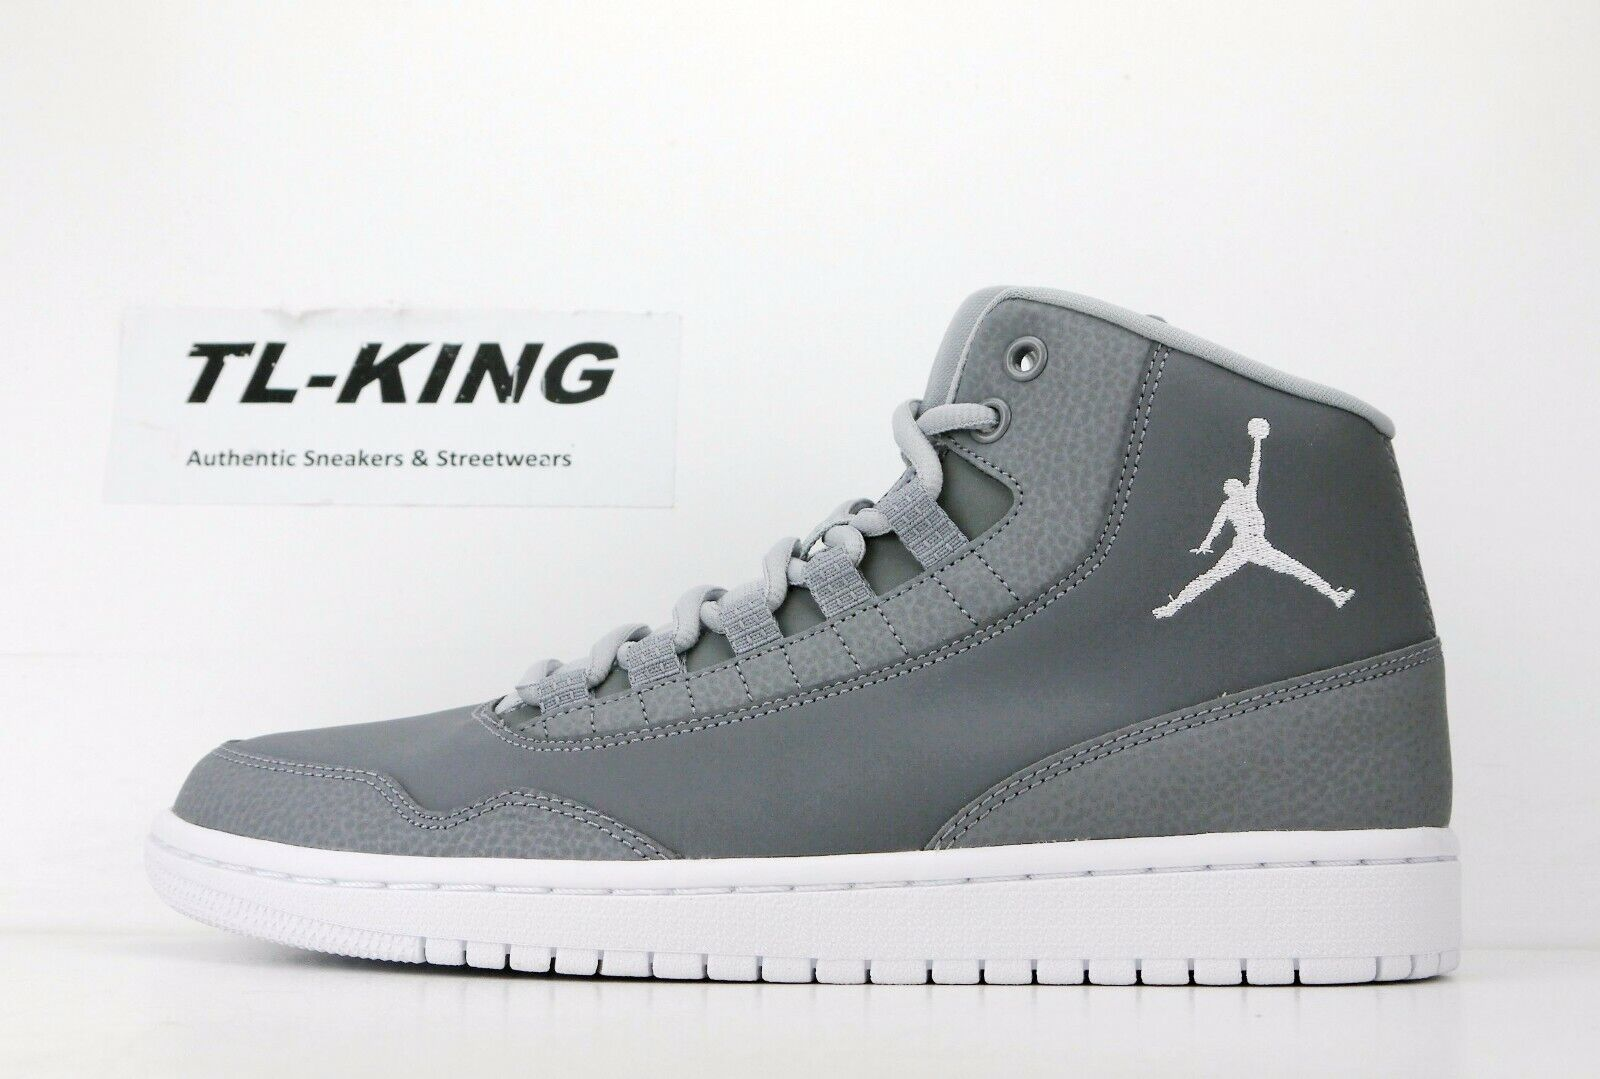 Jordan Air Nike Executive 820240 003 DE 100 Msrp Grey Wolf